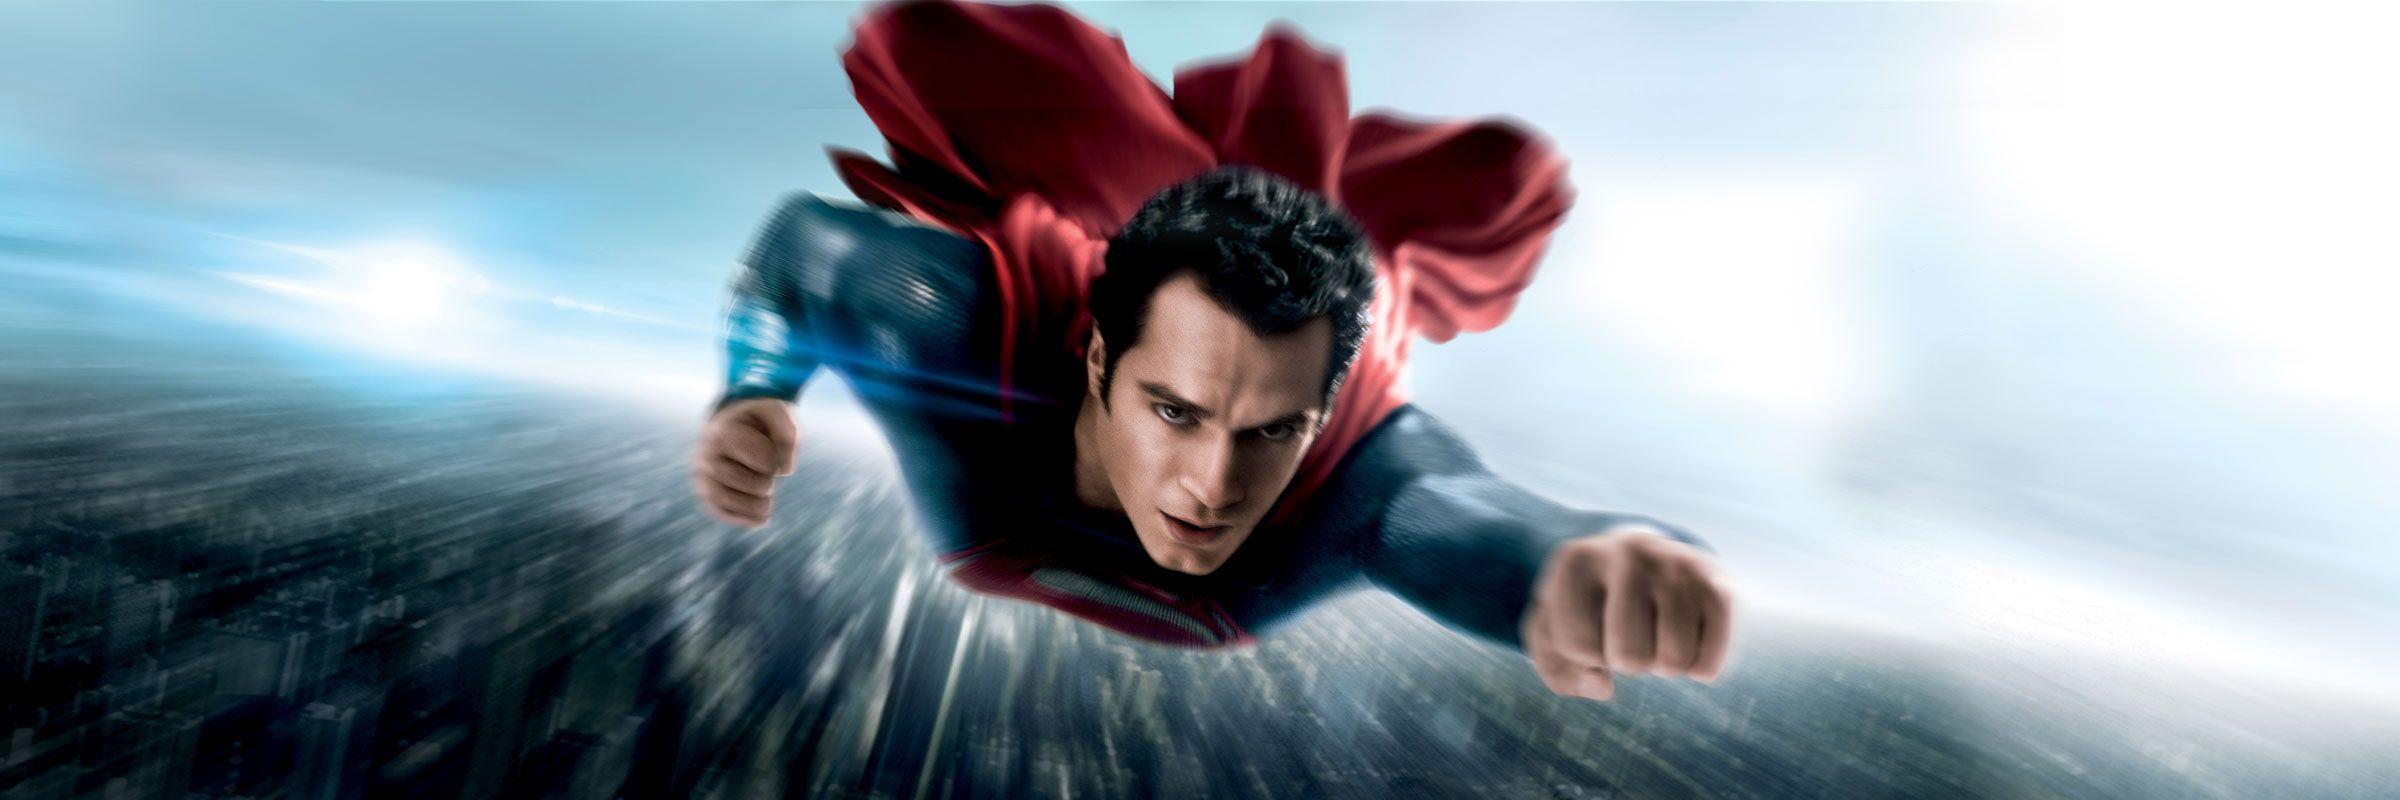 Man of Steel | Full Movie | Movies Anywhere